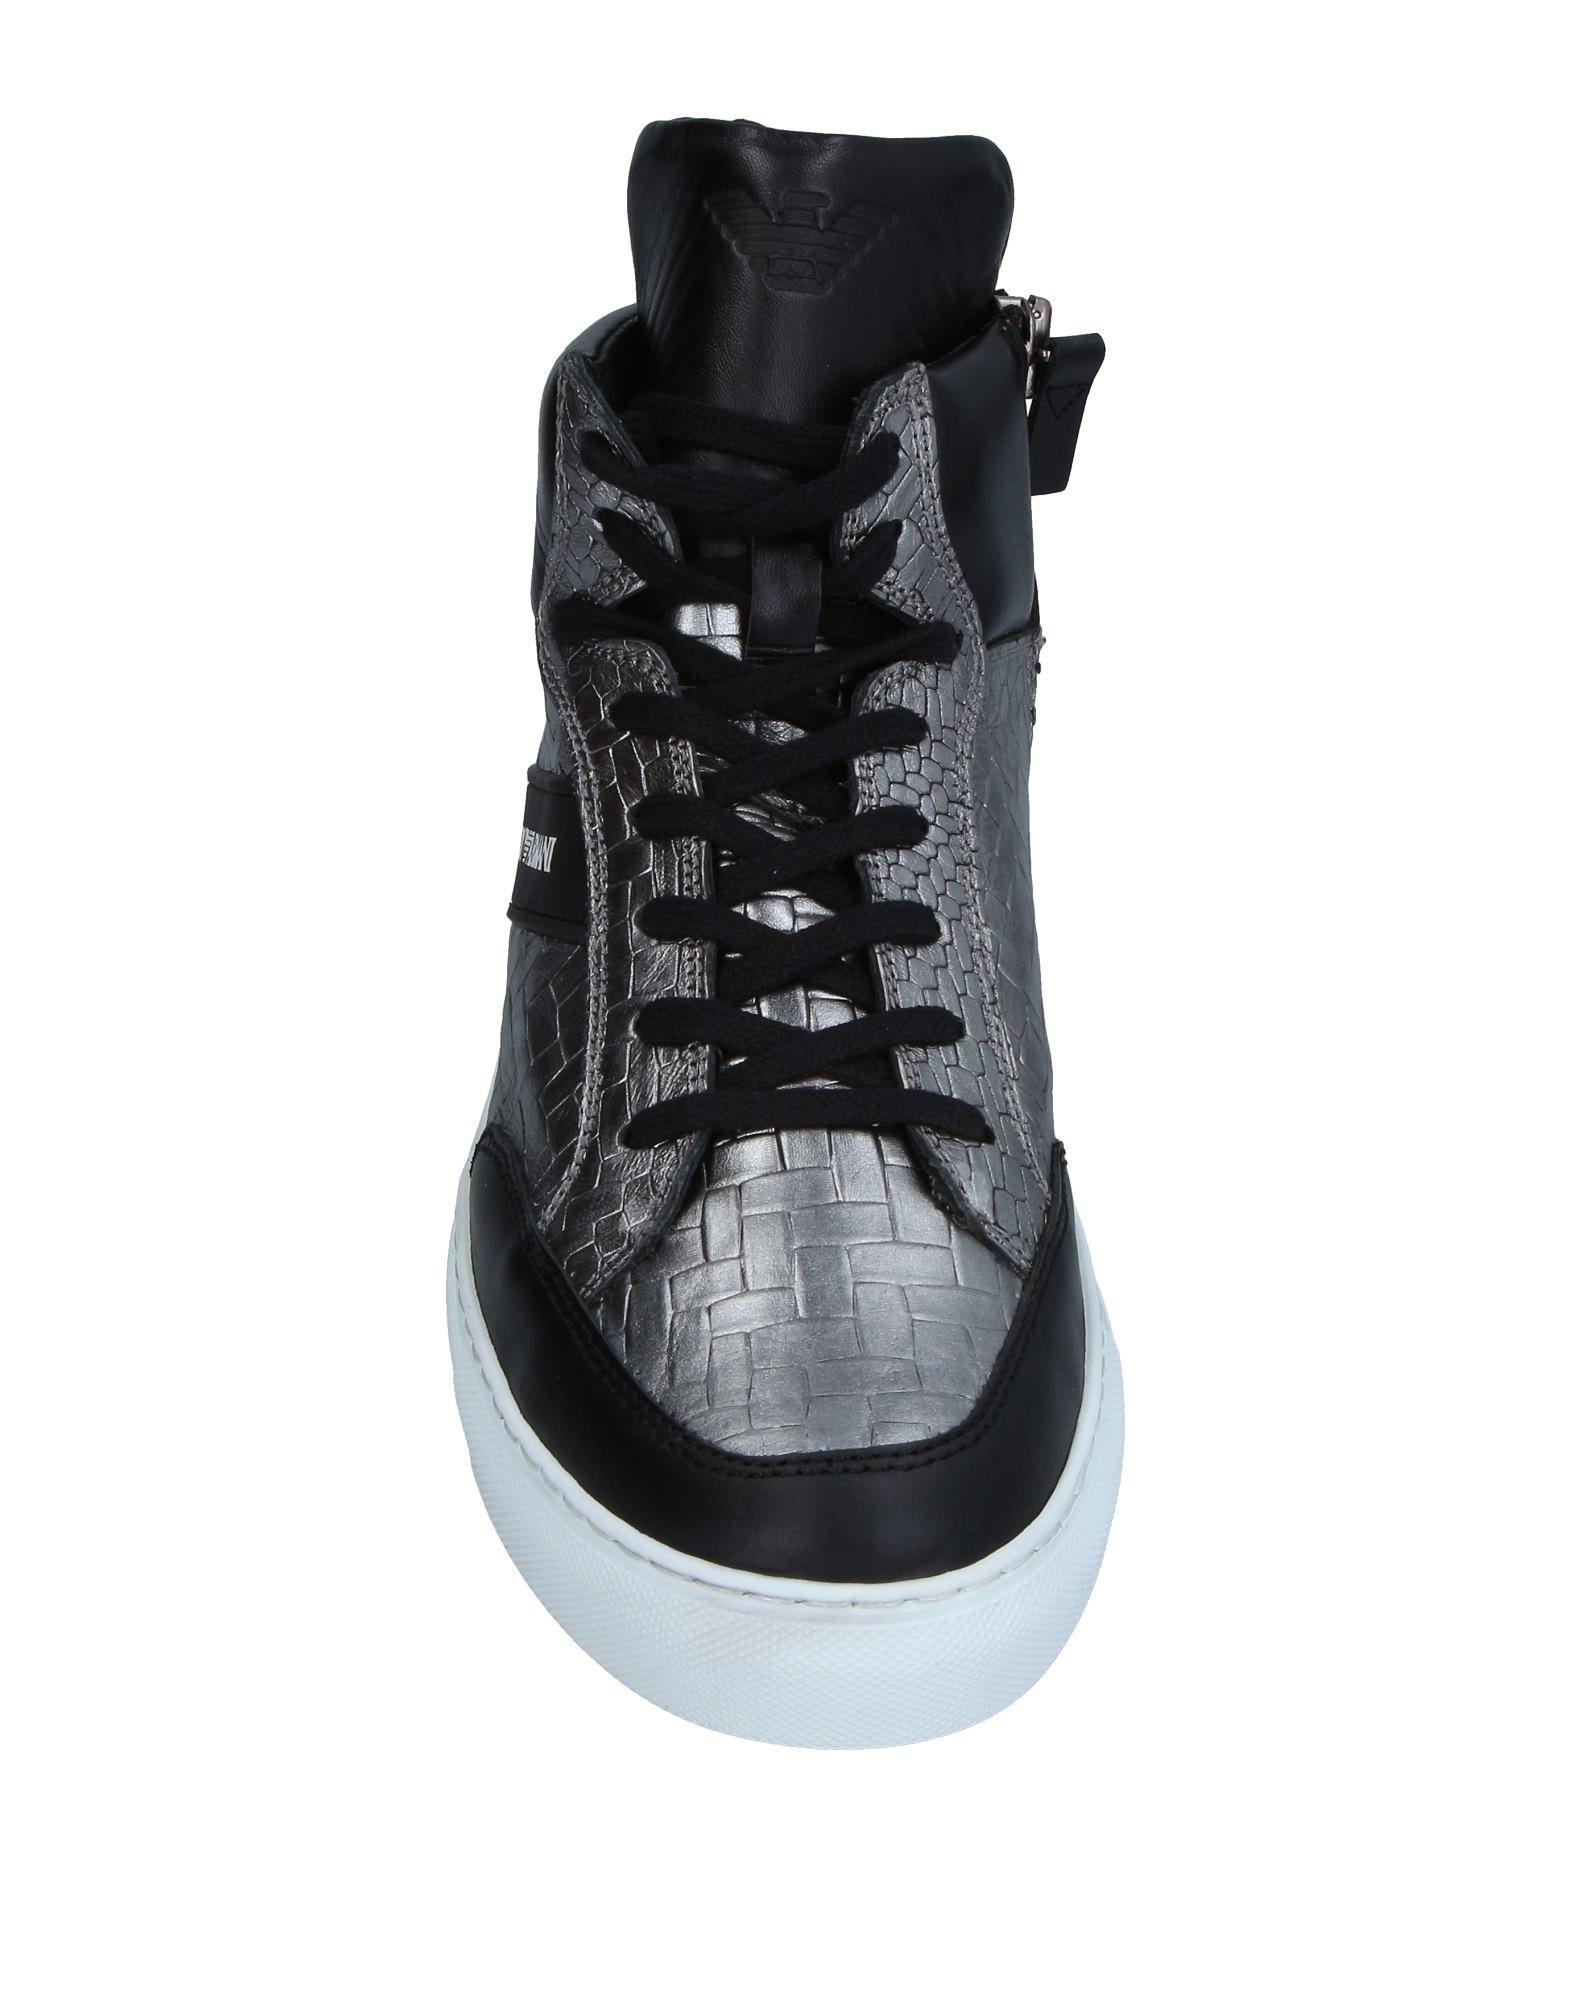 Emporio Armani Gute Sneakers Herren  11292014LK Gute Armani Qualität beliebte Schuhe cc589c